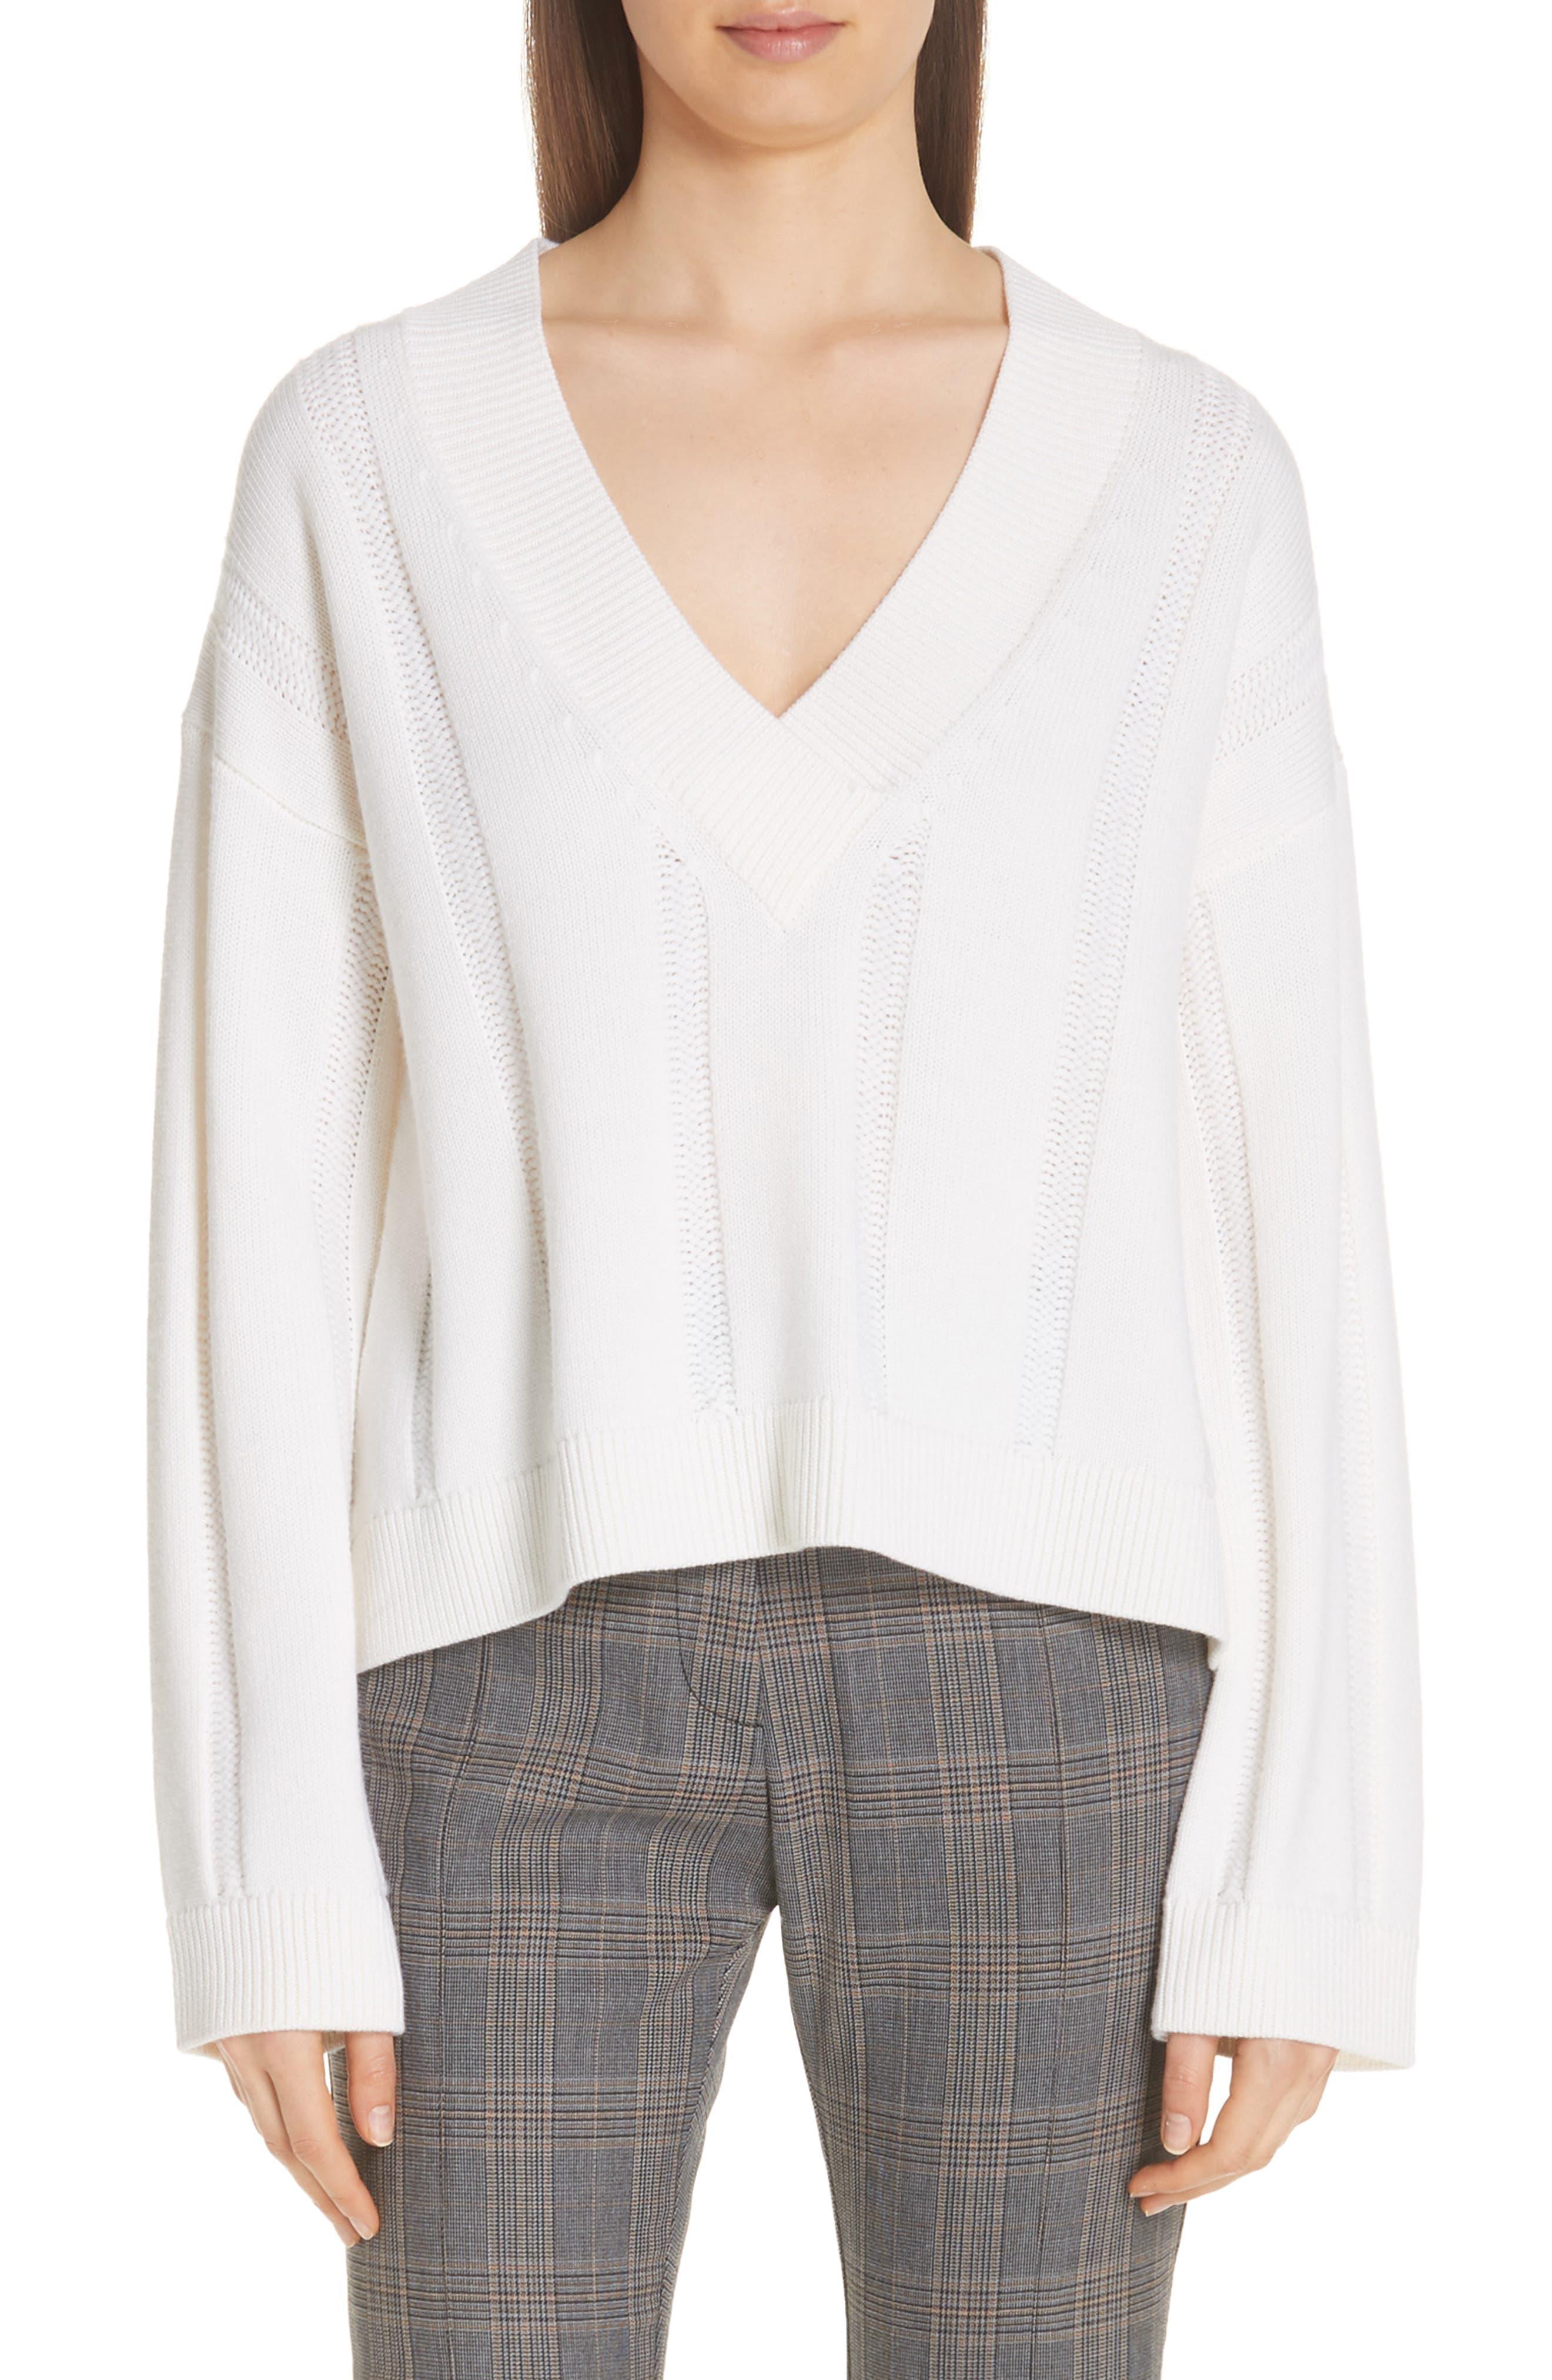 Derek Lam 10 Crosby V-Neck Wool Sweater, White